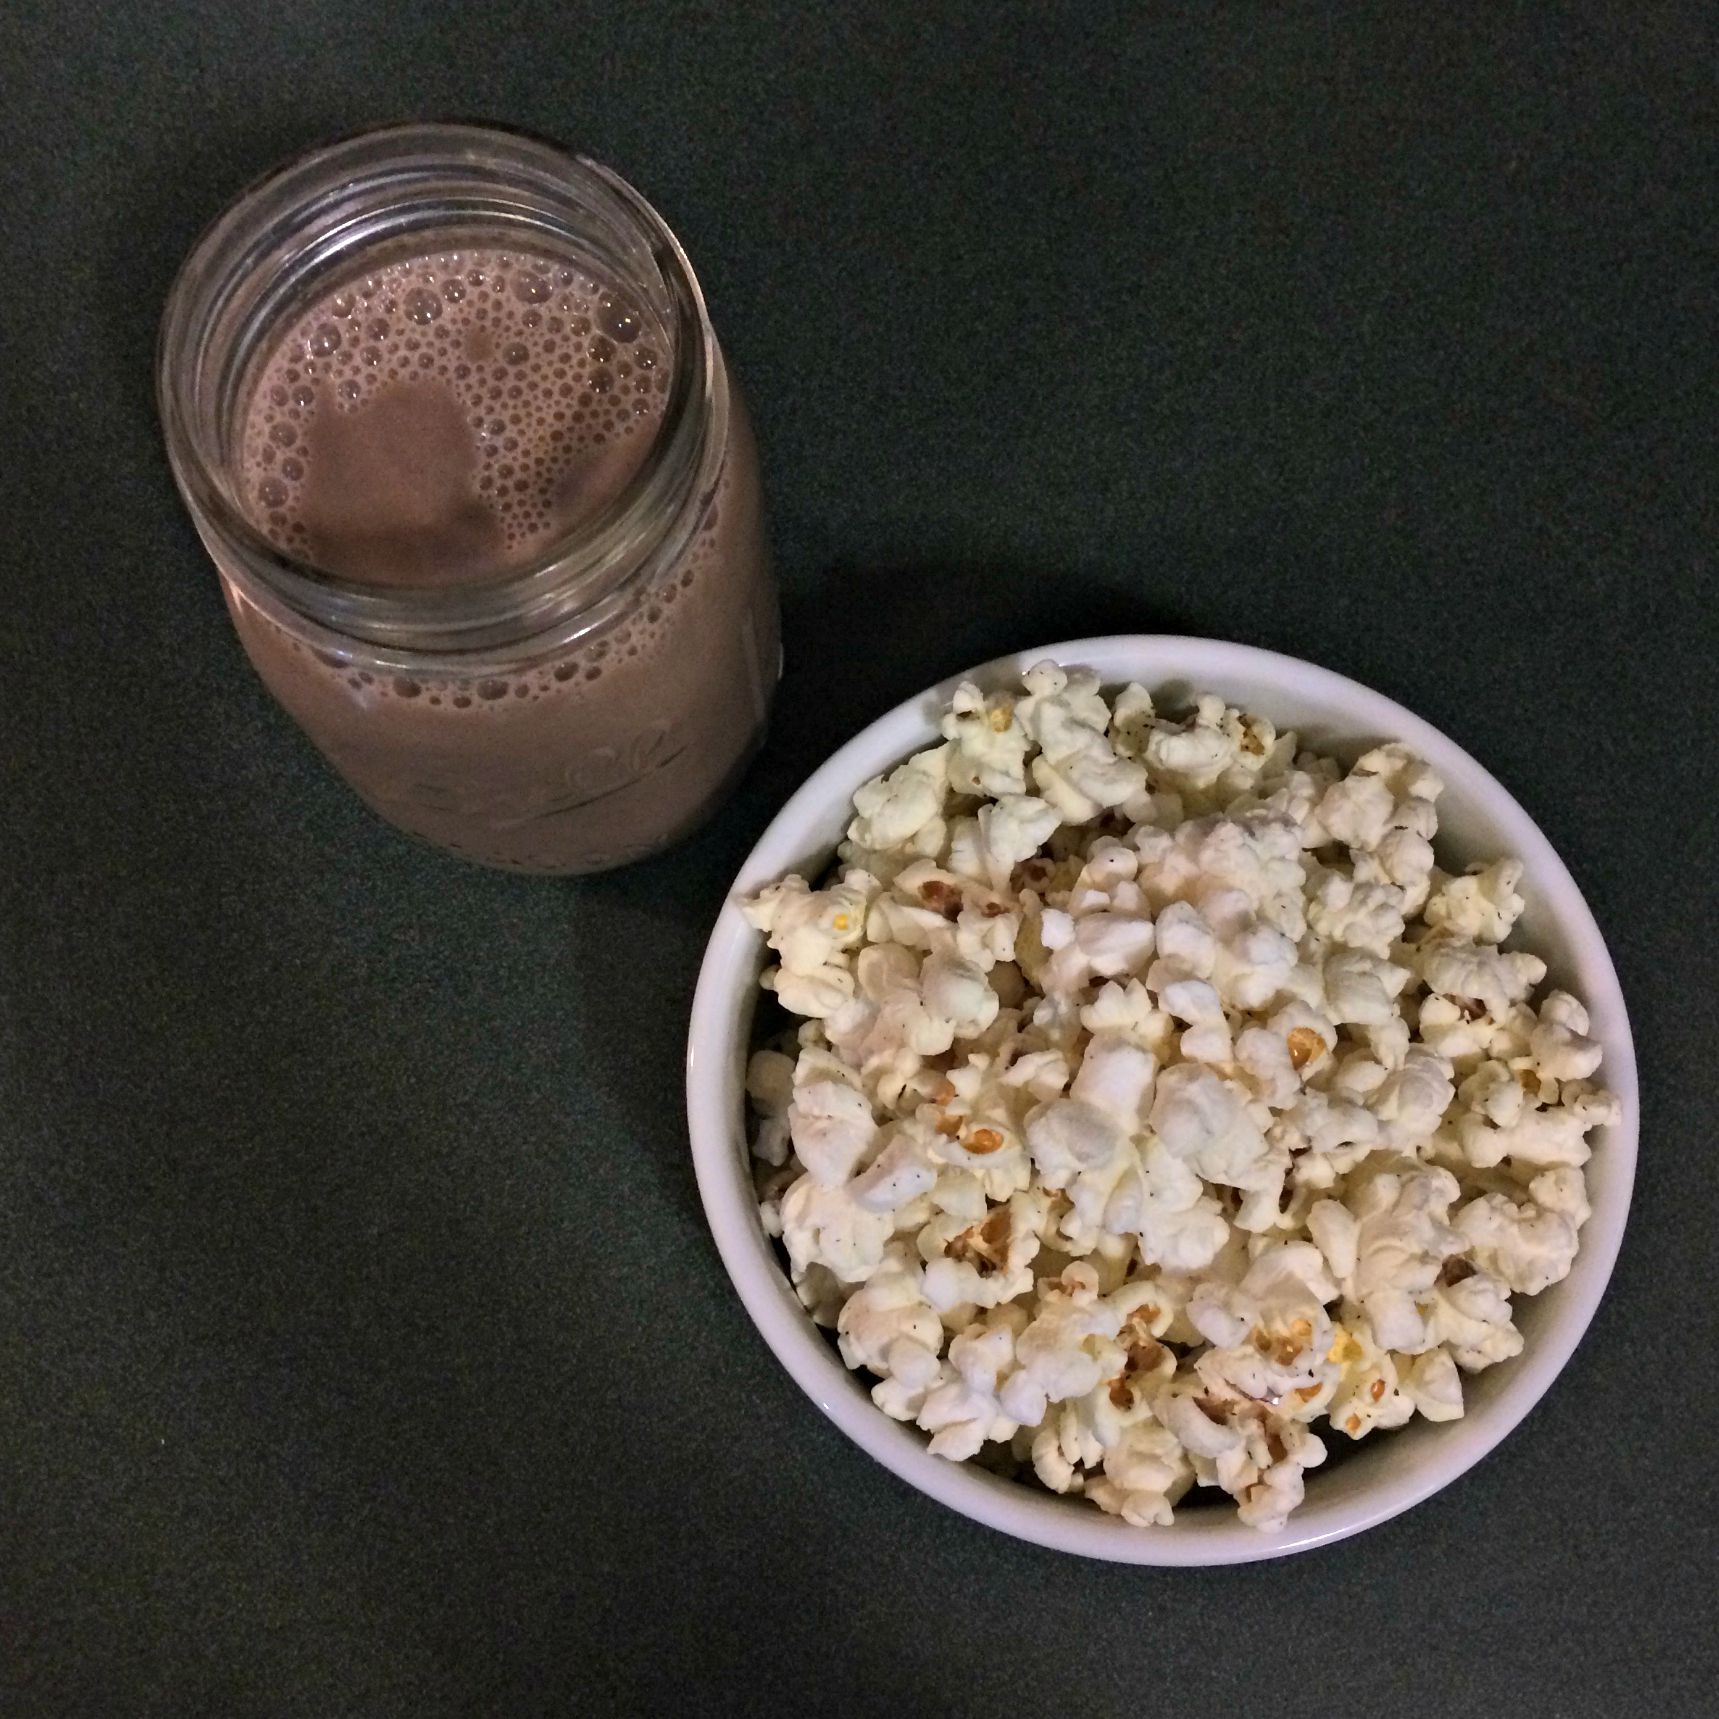 chocolate almond milk with skinny pop popcorn